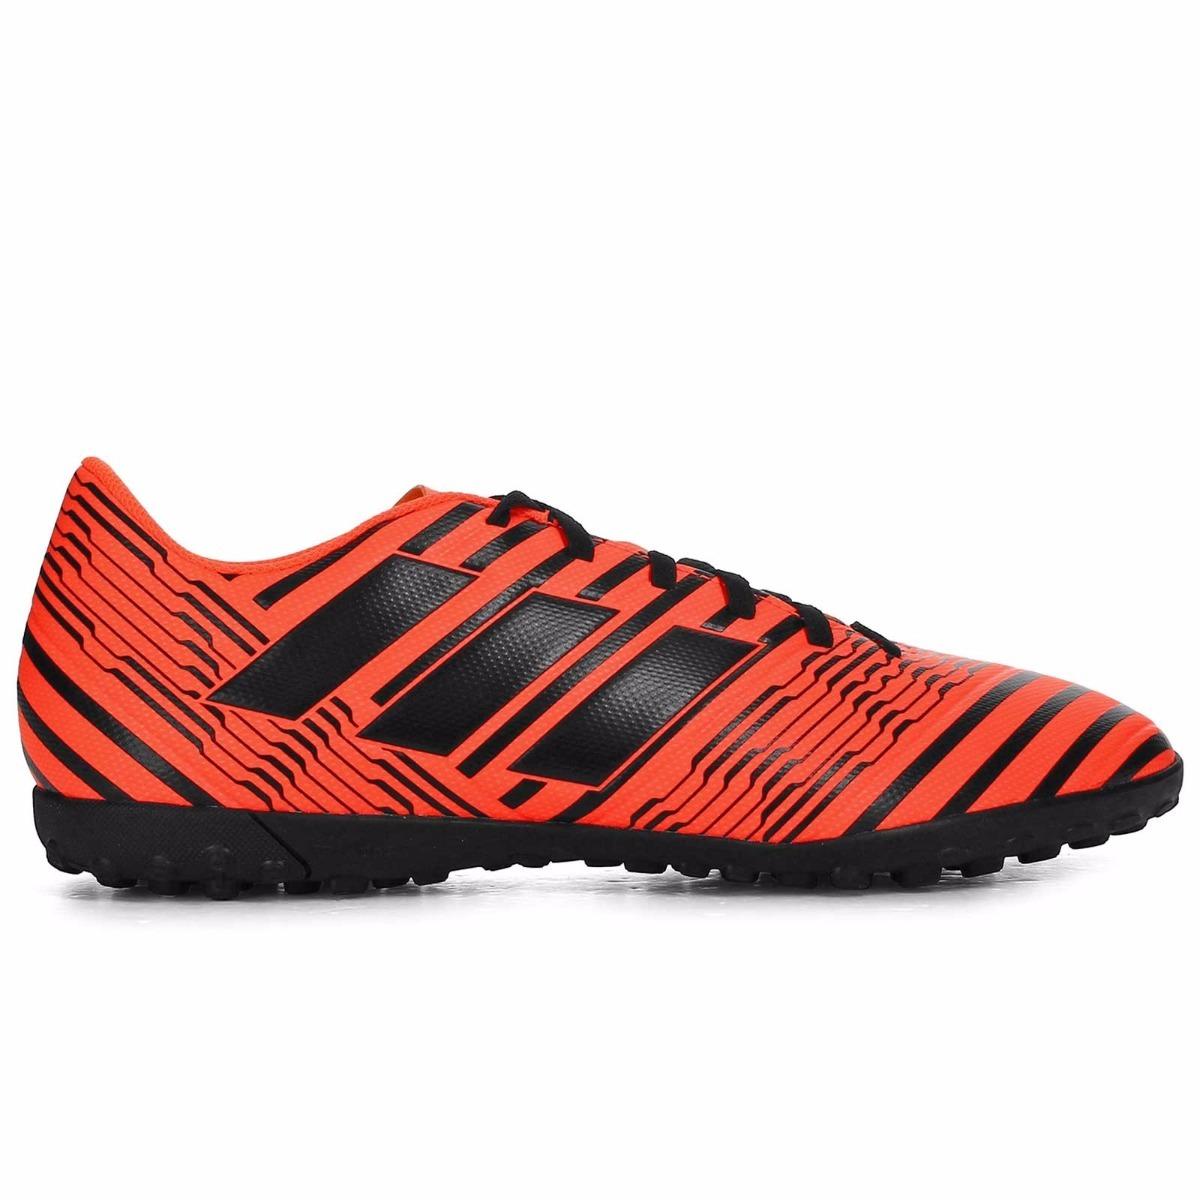 on sale cb834 15aee tenis futbol rapido adidas nemeziz color naranja original. Cargando zoom.